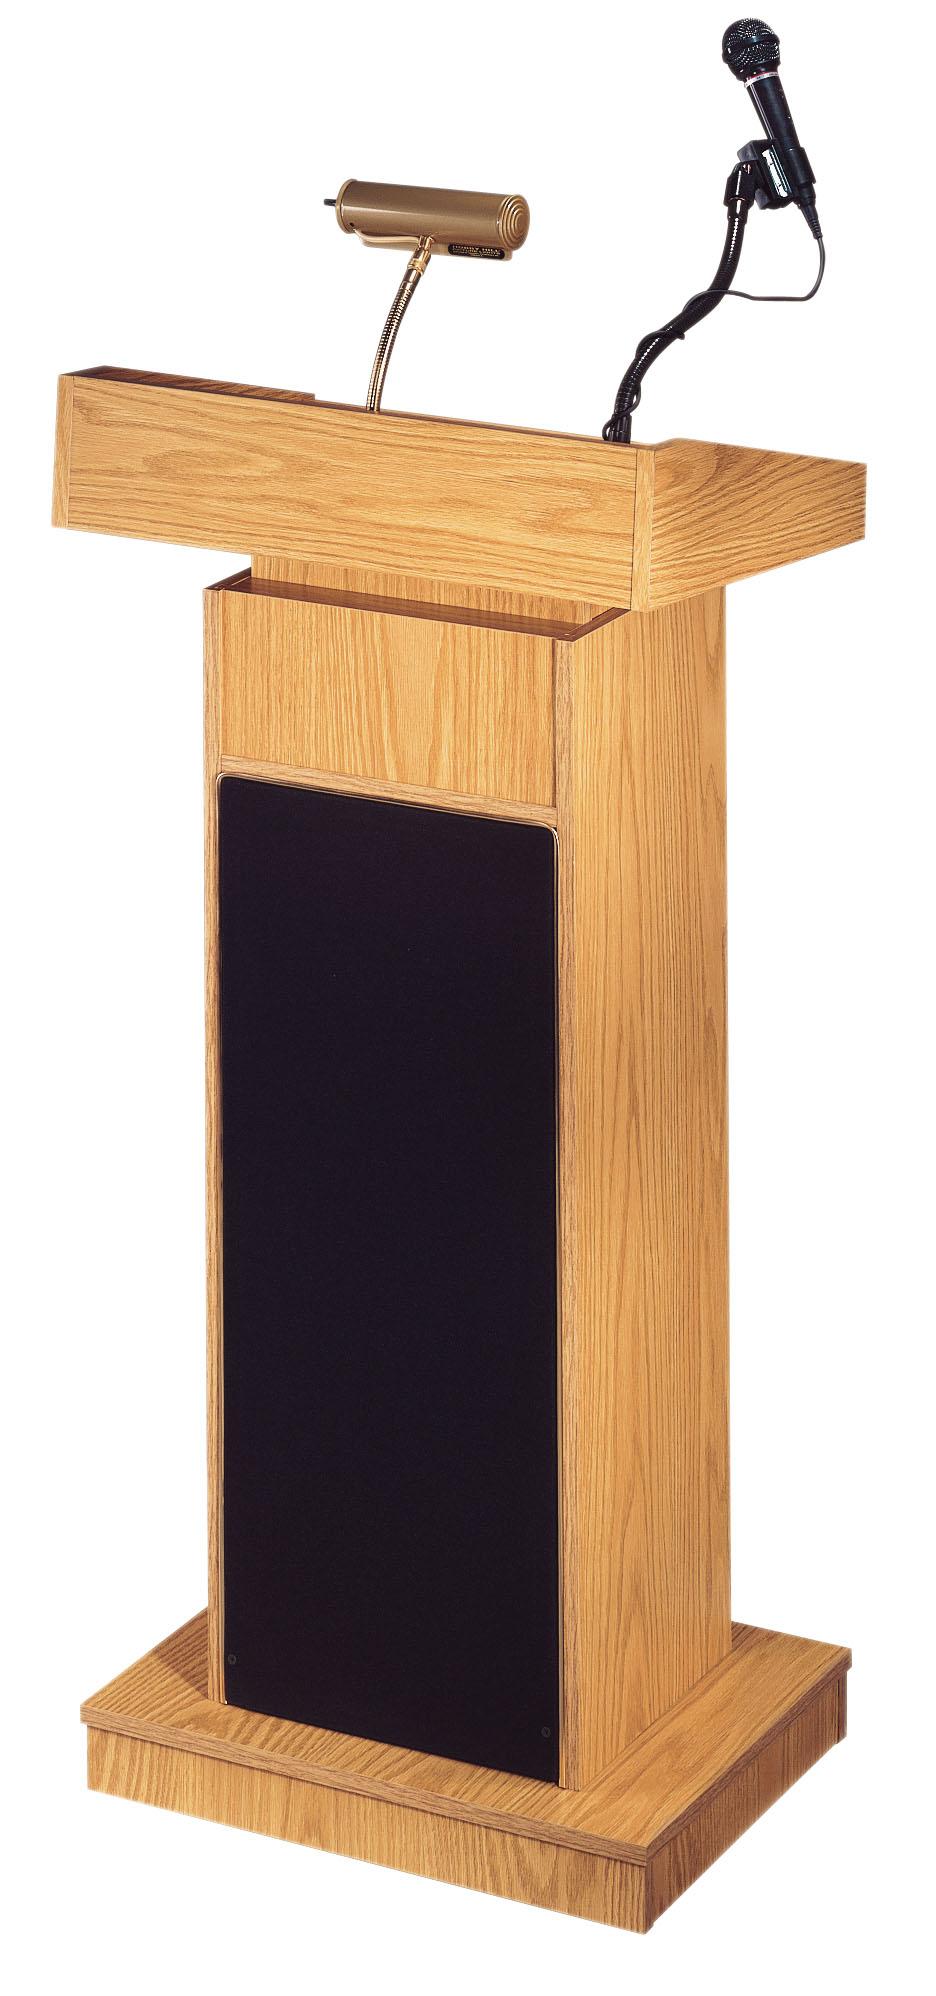 Clipart desk speech. Free podium cliparts download